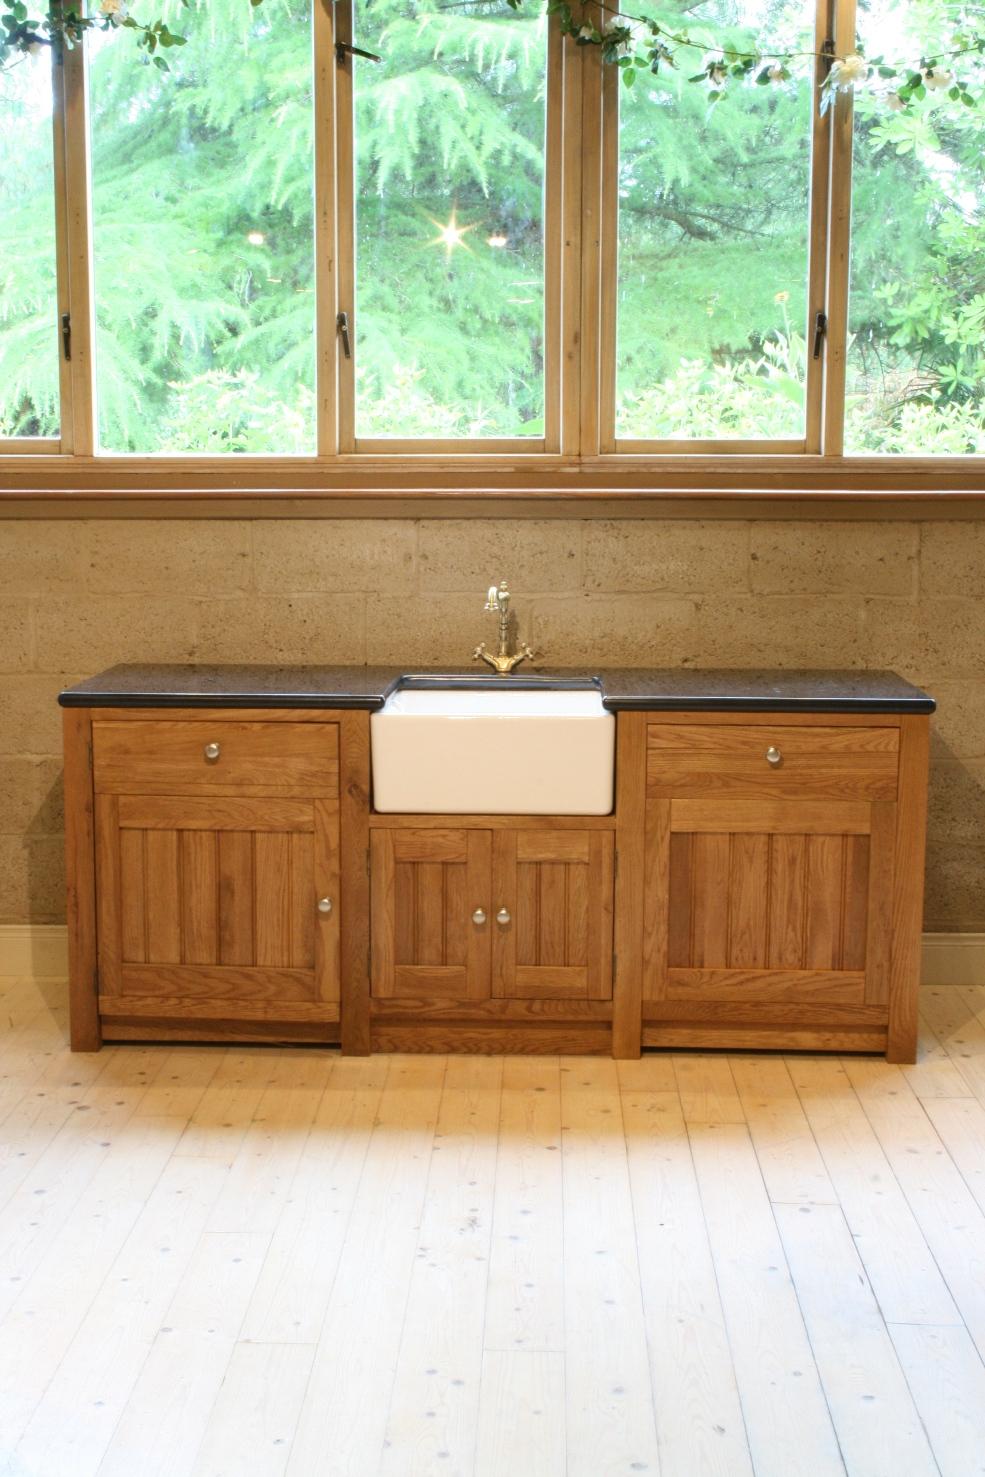 The Free Standing Kitchen Collection Strawbridge